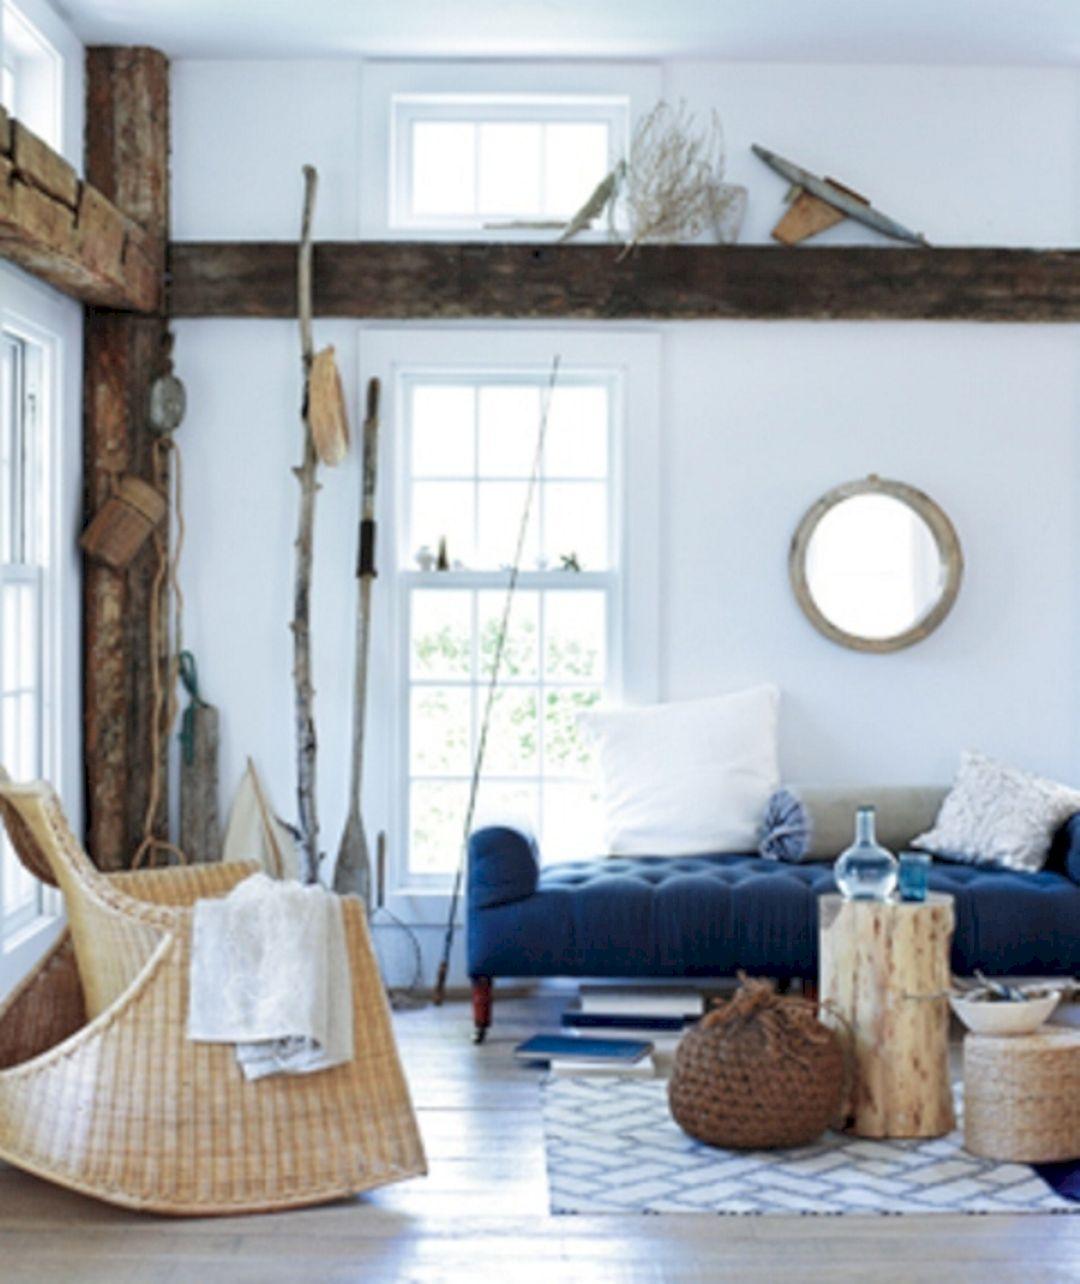 Beach Inspired Room Decor & 25+ Unique Rustic Coastal Nautical Living Room Ideas For Amazing ...